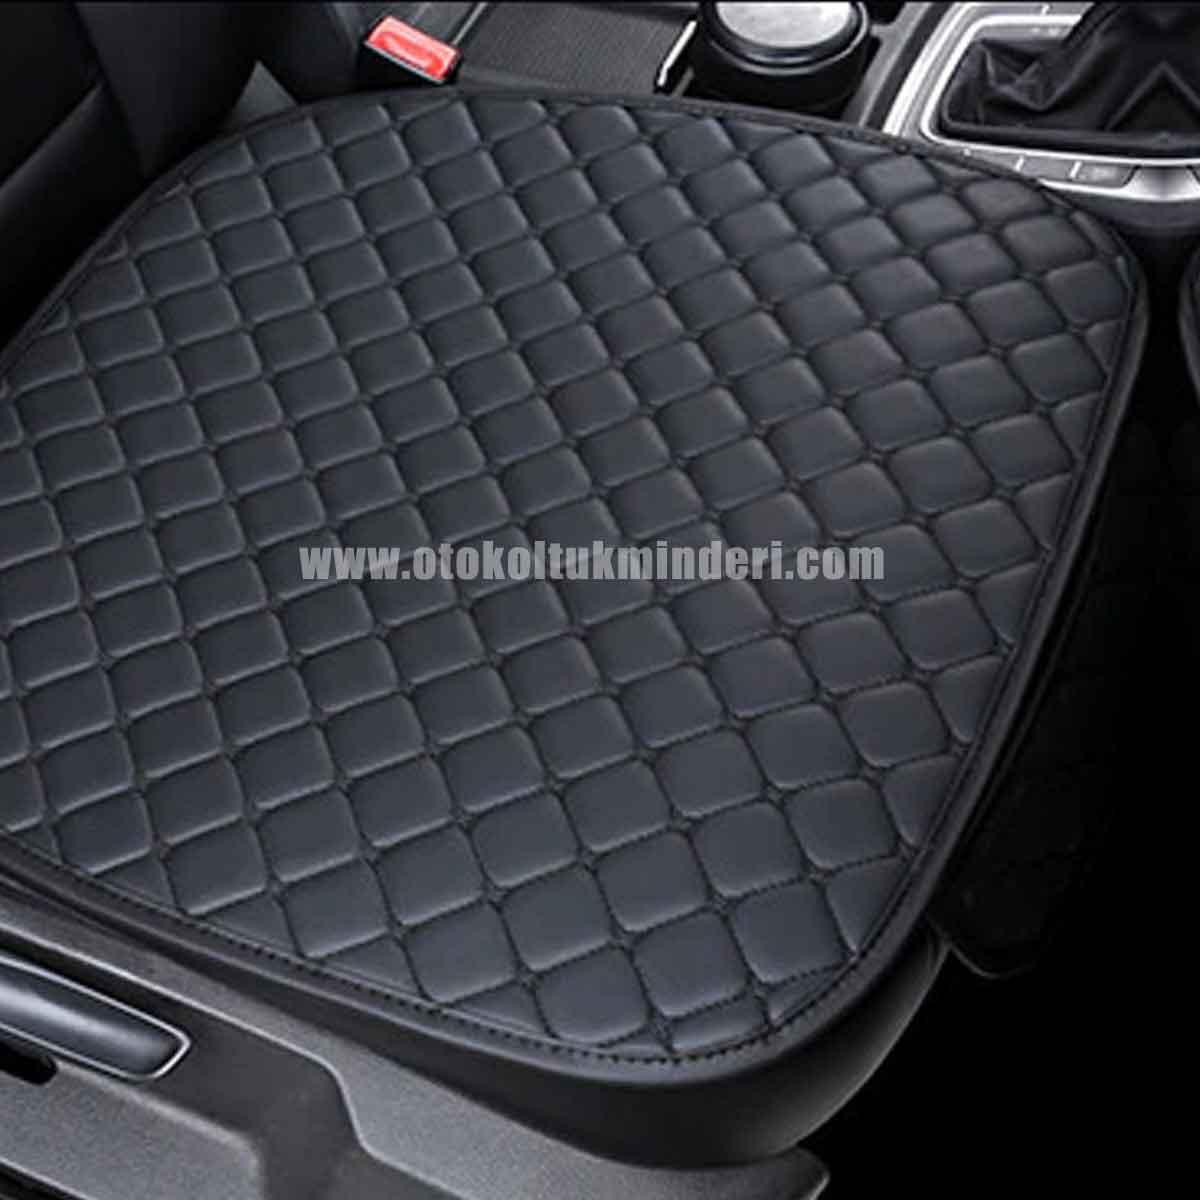 Renault oto koltuk kılıfı - Renault Koltuk minderi Siyah Deri Cepli